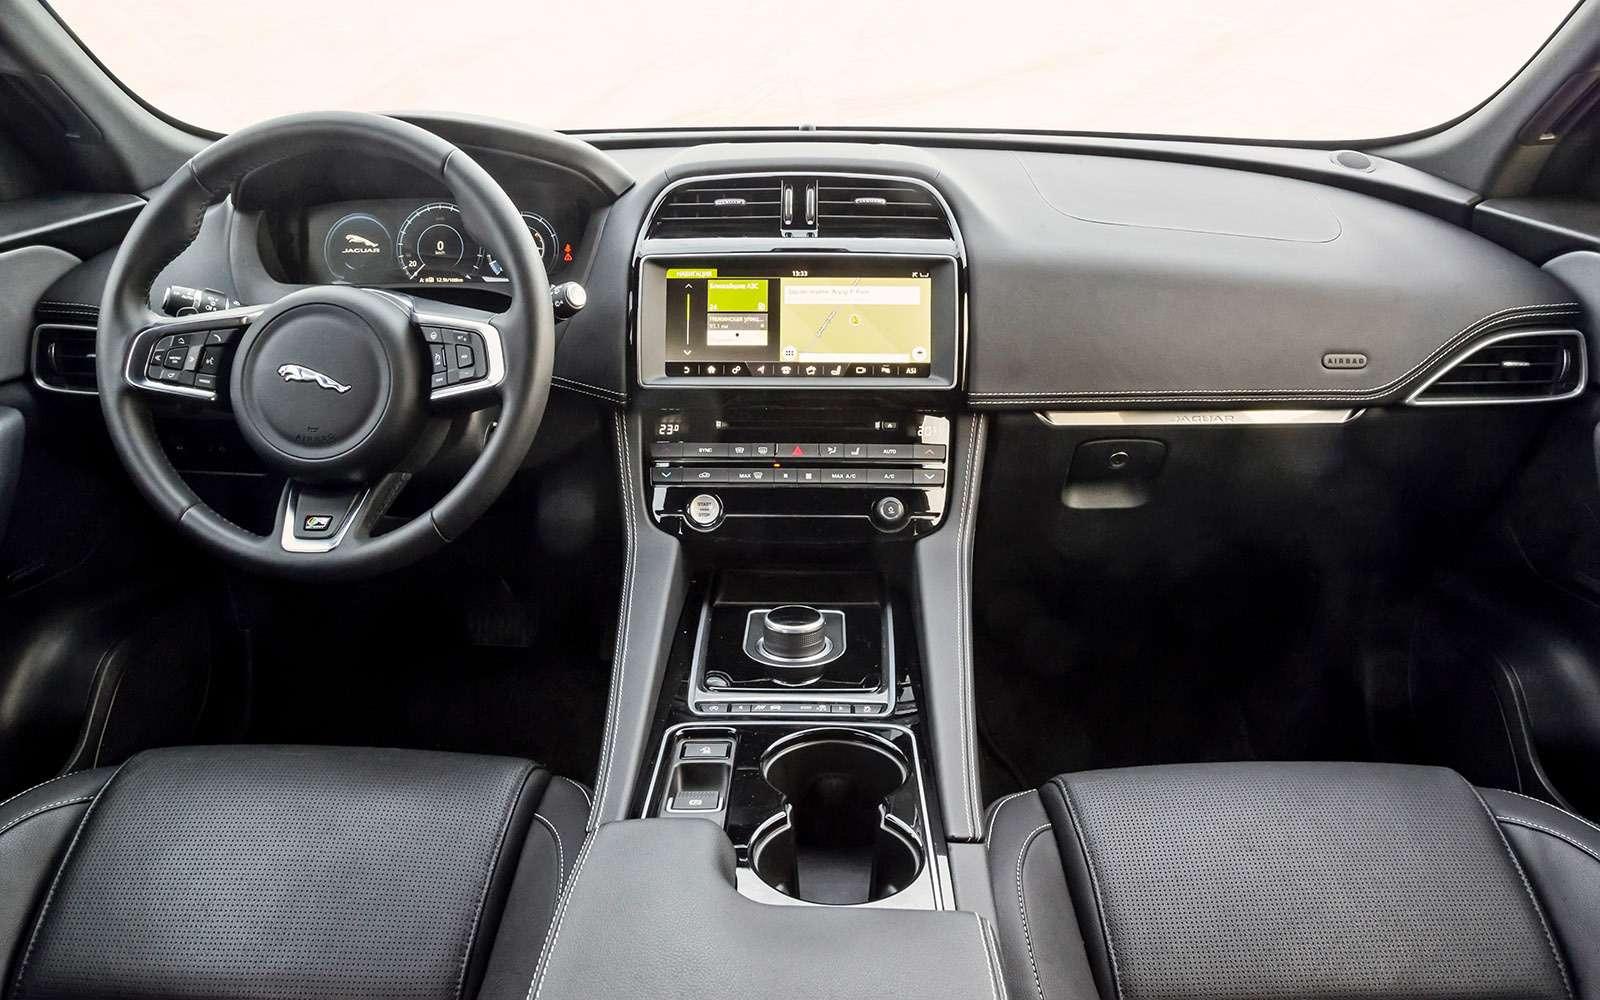 Тест премиум-кроссоверов: Lexus RX350, Cadillac XT5и Jaguar F-Pace— фото 721757